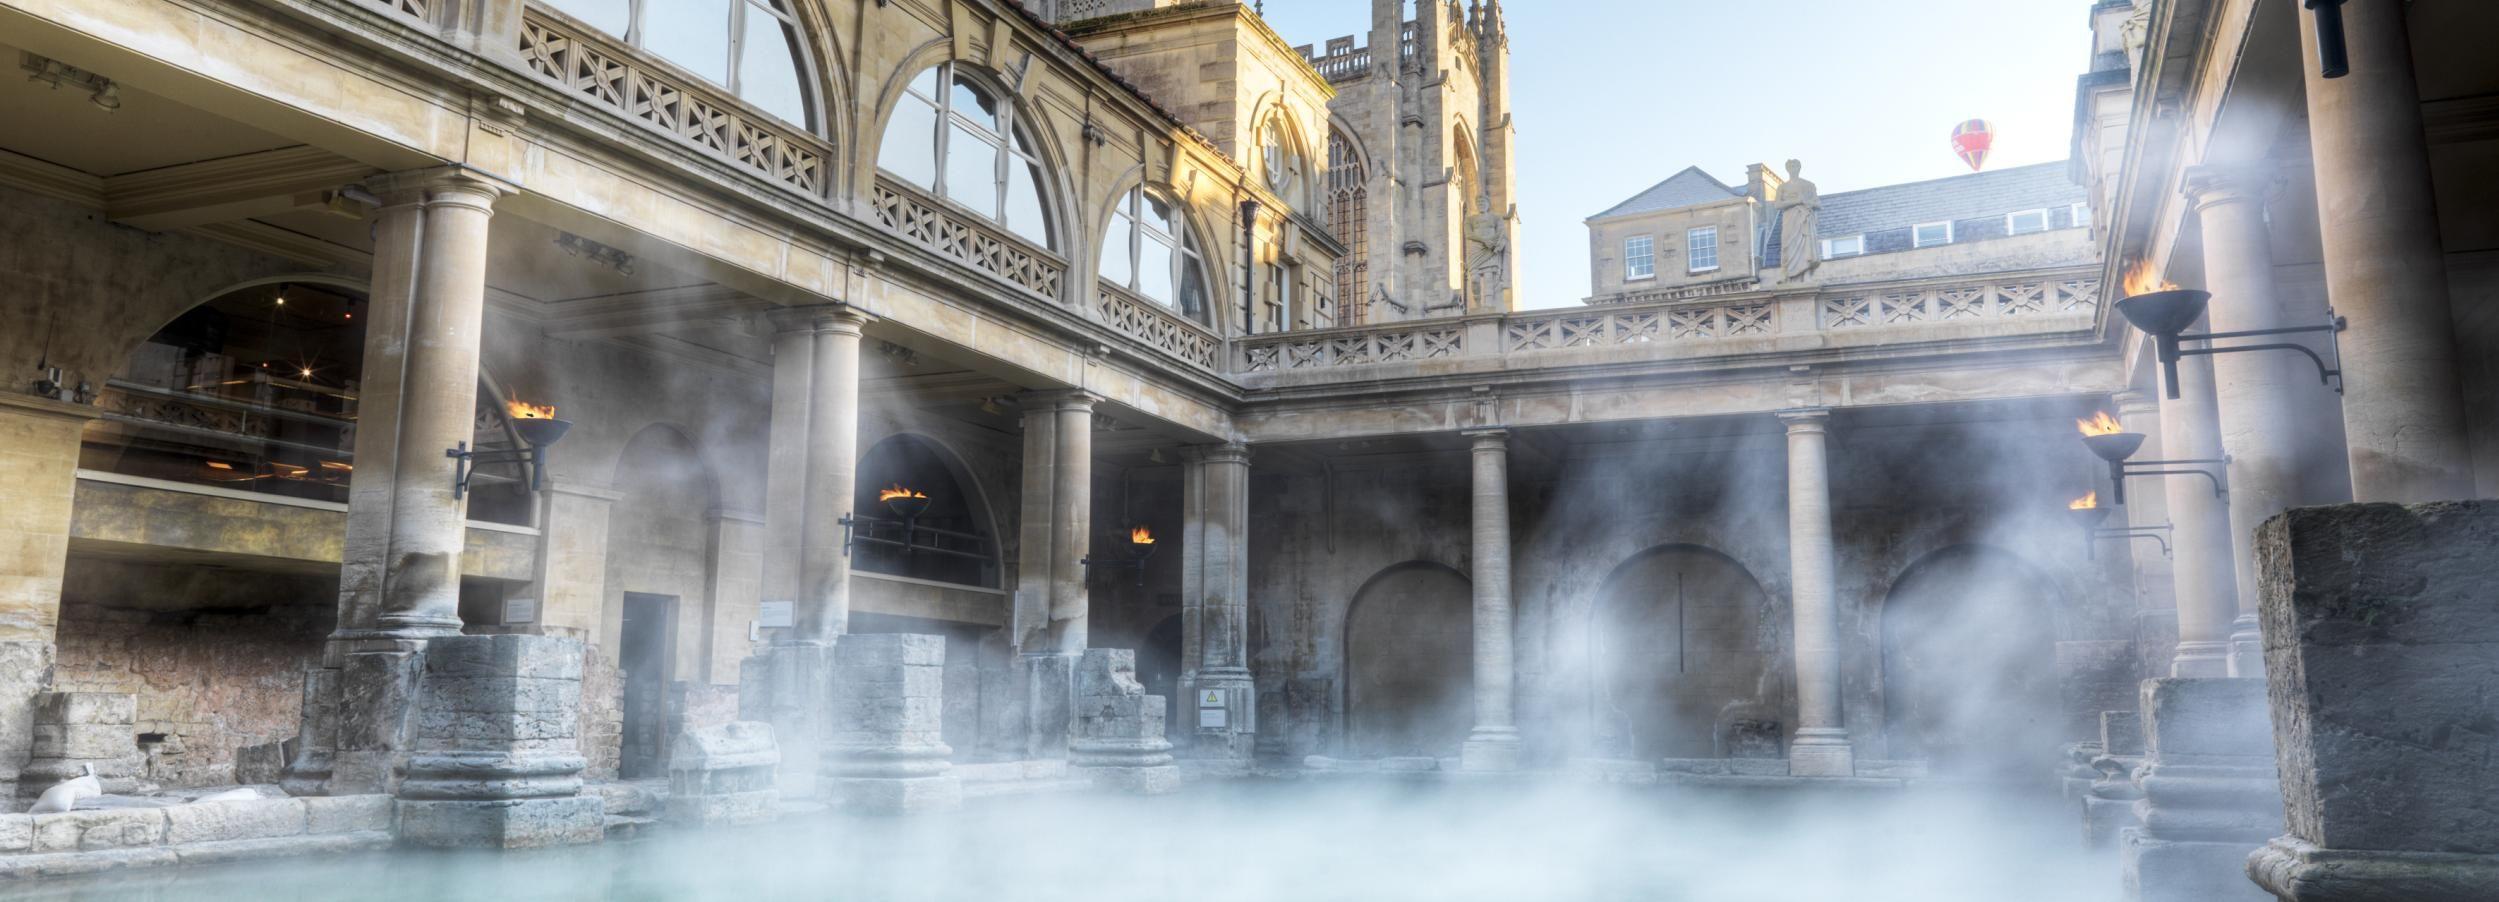 Stonehenge & Roman Baths: Full-Day Tour from London